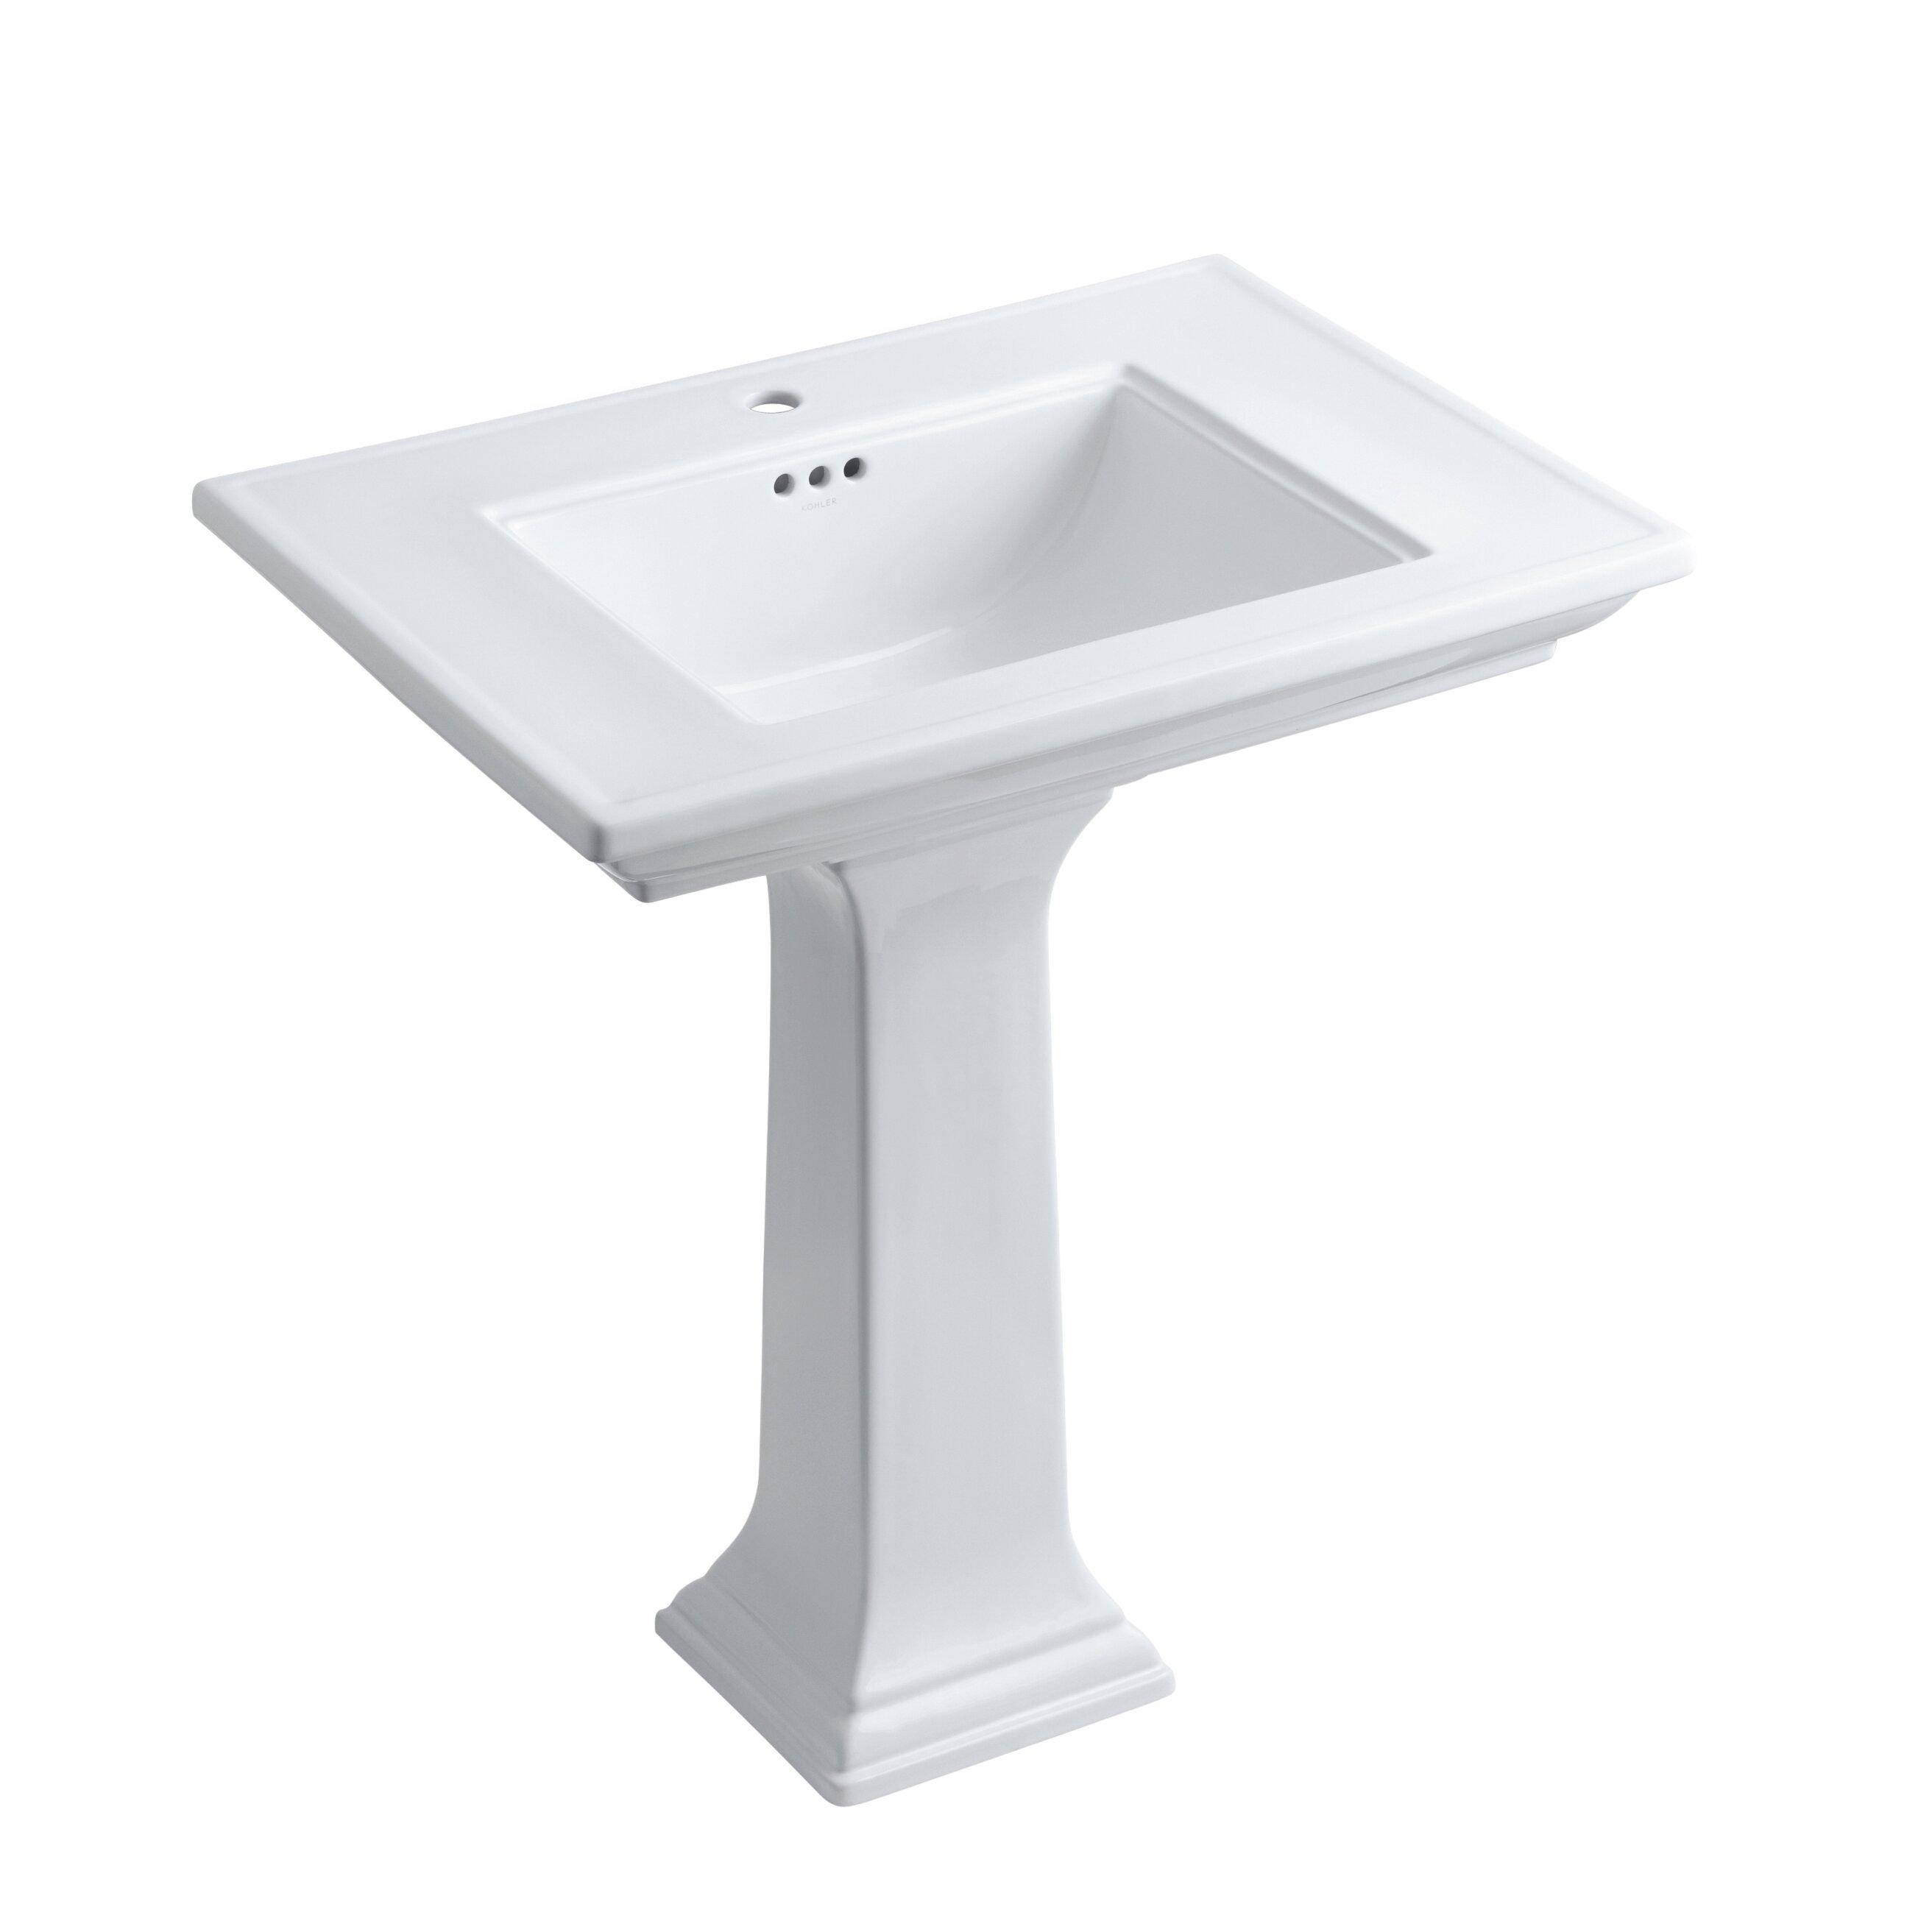 Home Improvement Bathroom Fixtures ... Kohler Part #: K-2268-8 SKU ...